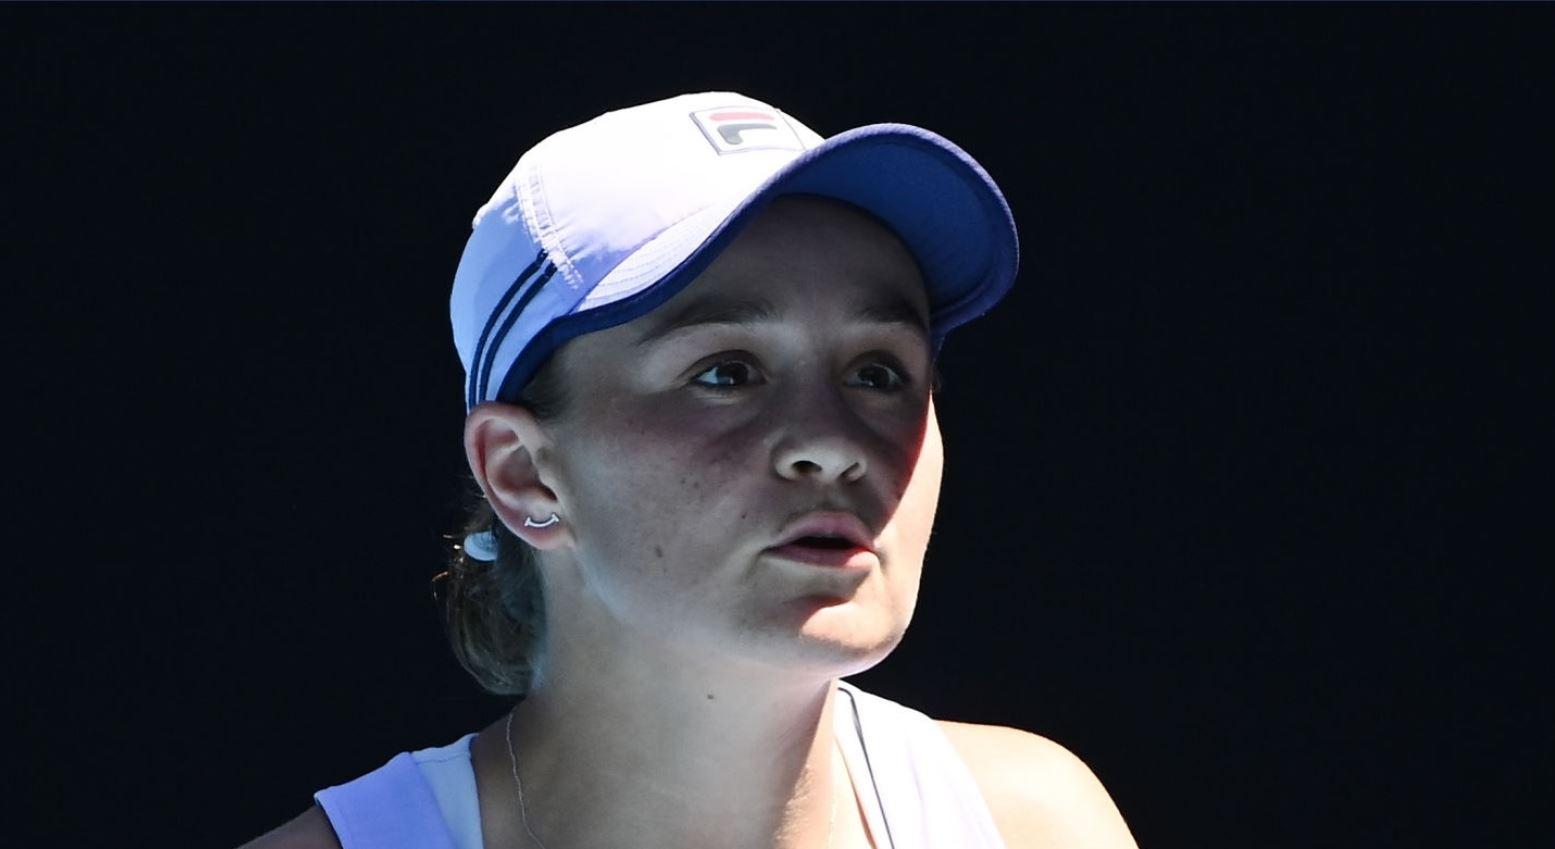 Barty - Prva igralka sveta v Adelaidu izgubila že v drugem krogu